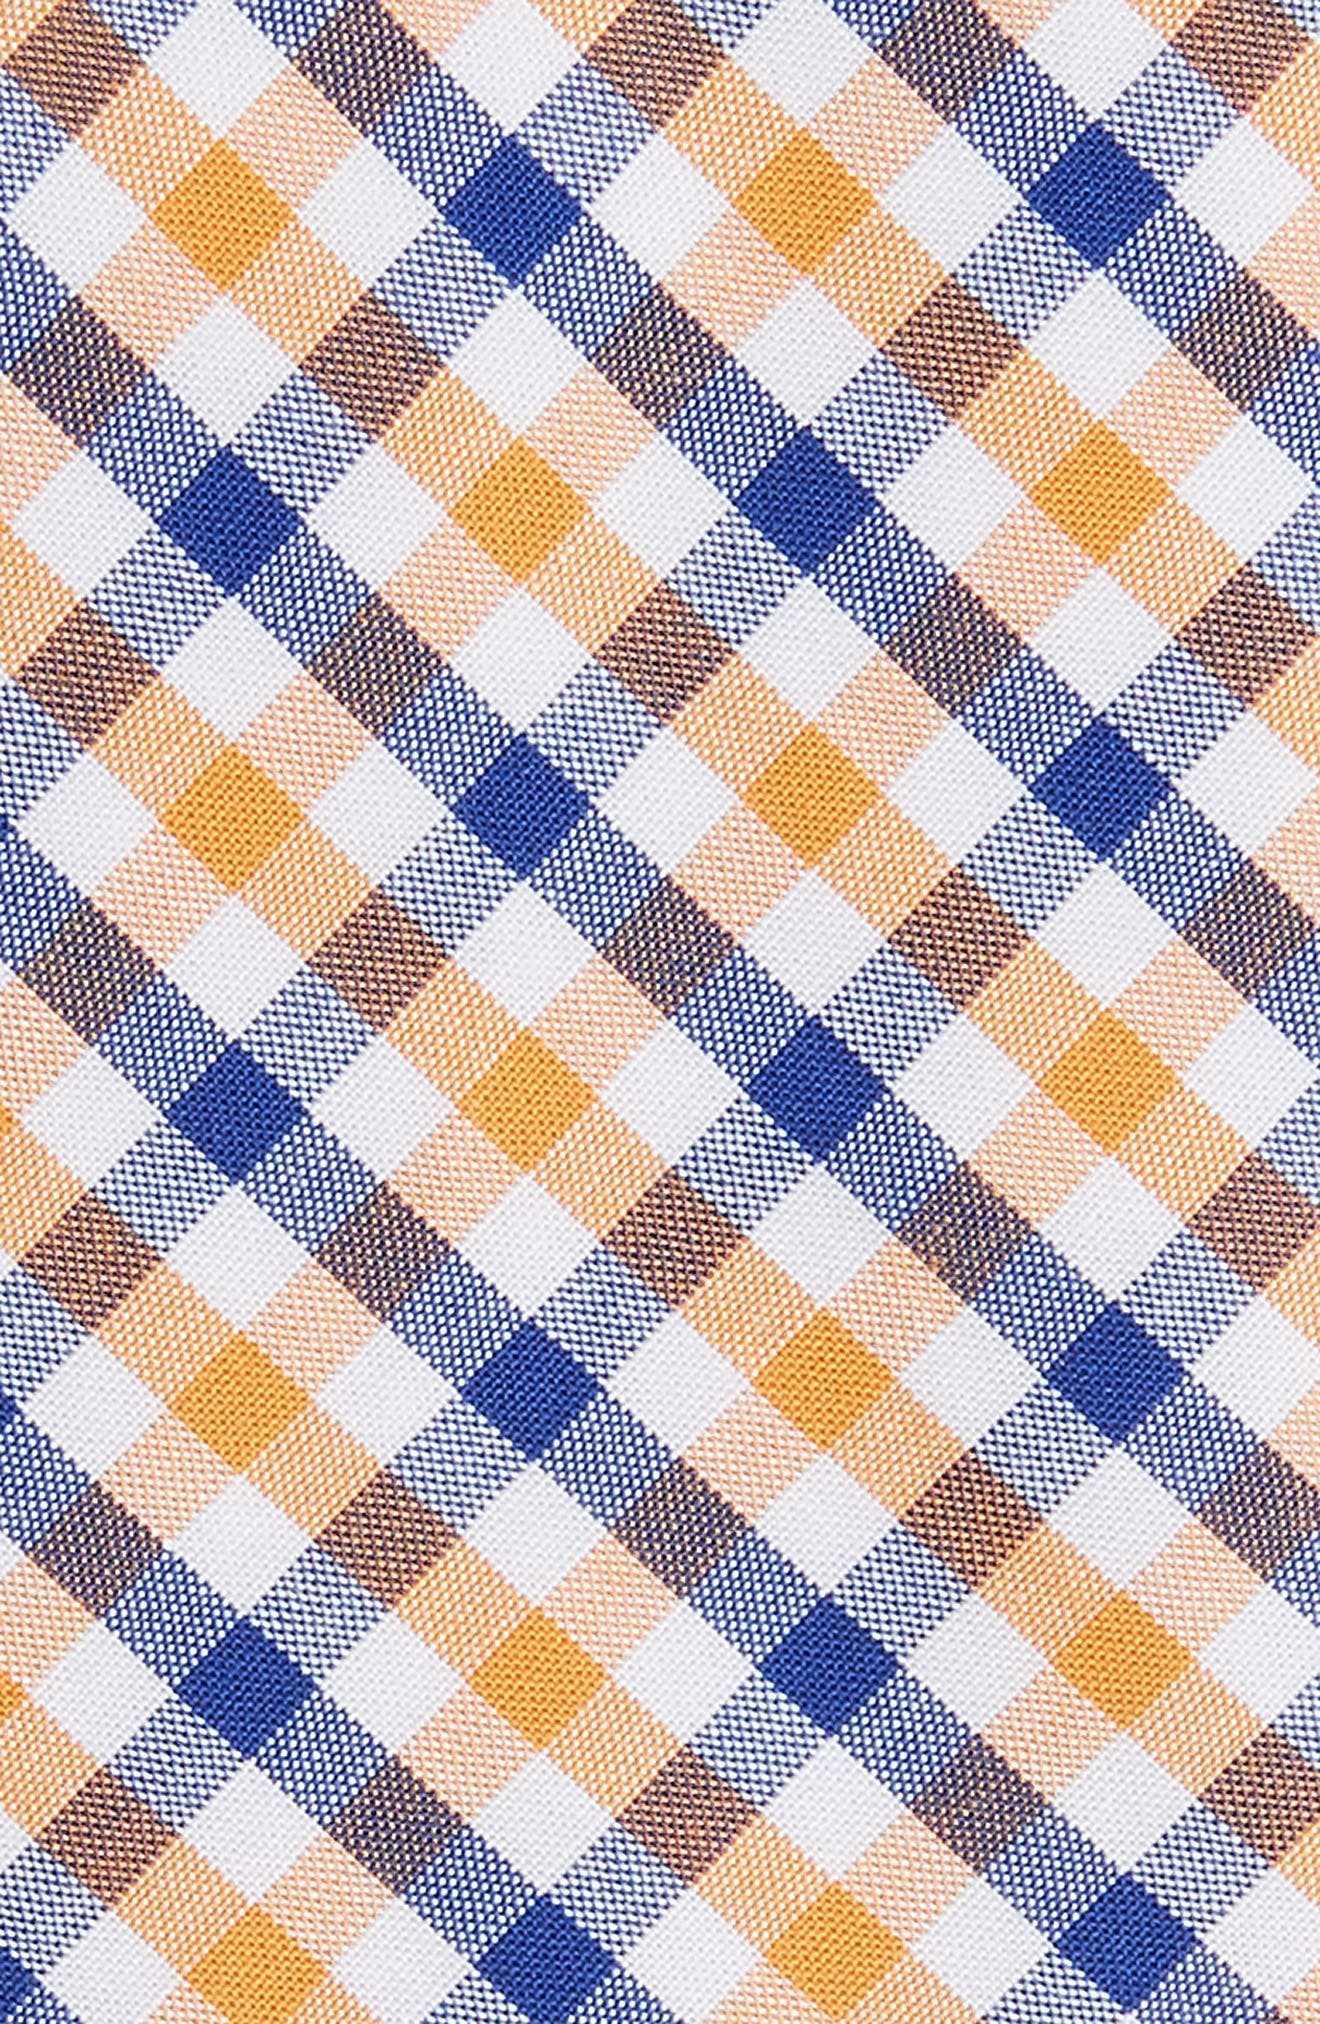 Robin Diamond Check Skinny Tie,                             Alternate thumbnail 10, color,